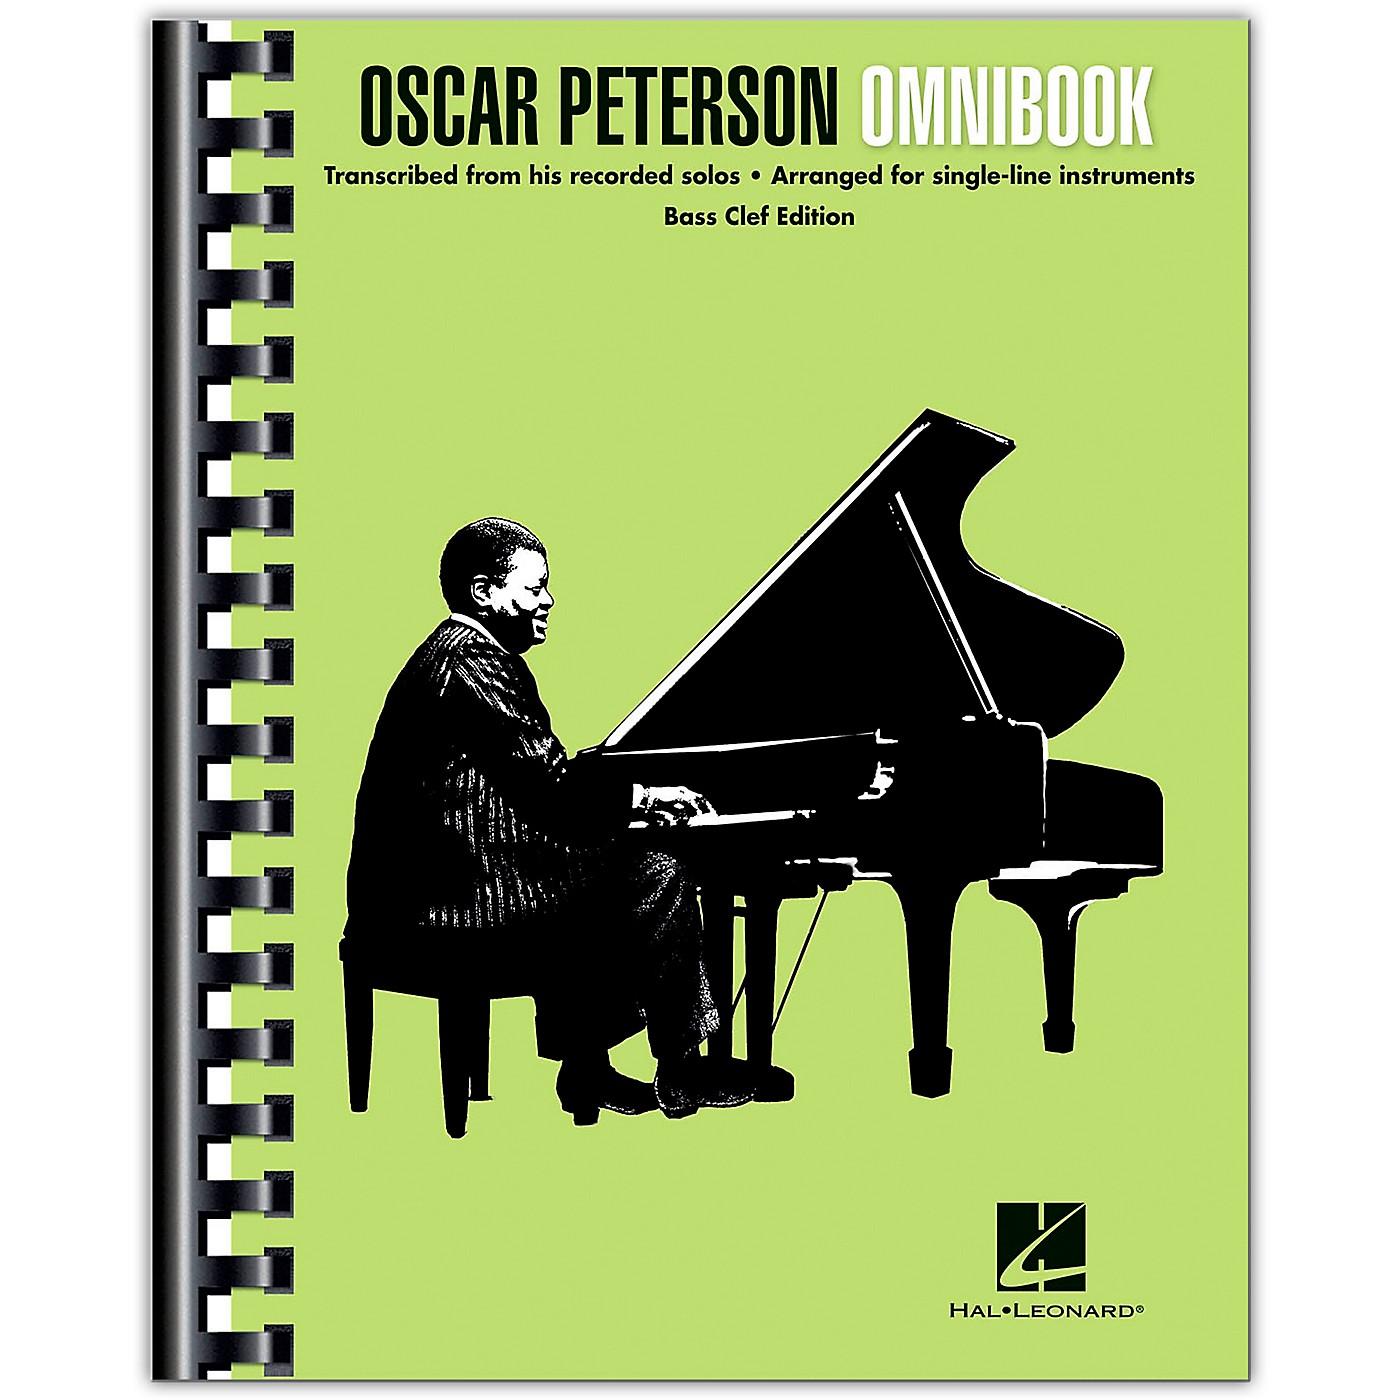 Hal Leonard Oscar Peterson - Omnibook (Bass Clef Instruments) Jazz Transcriptions thumbnail